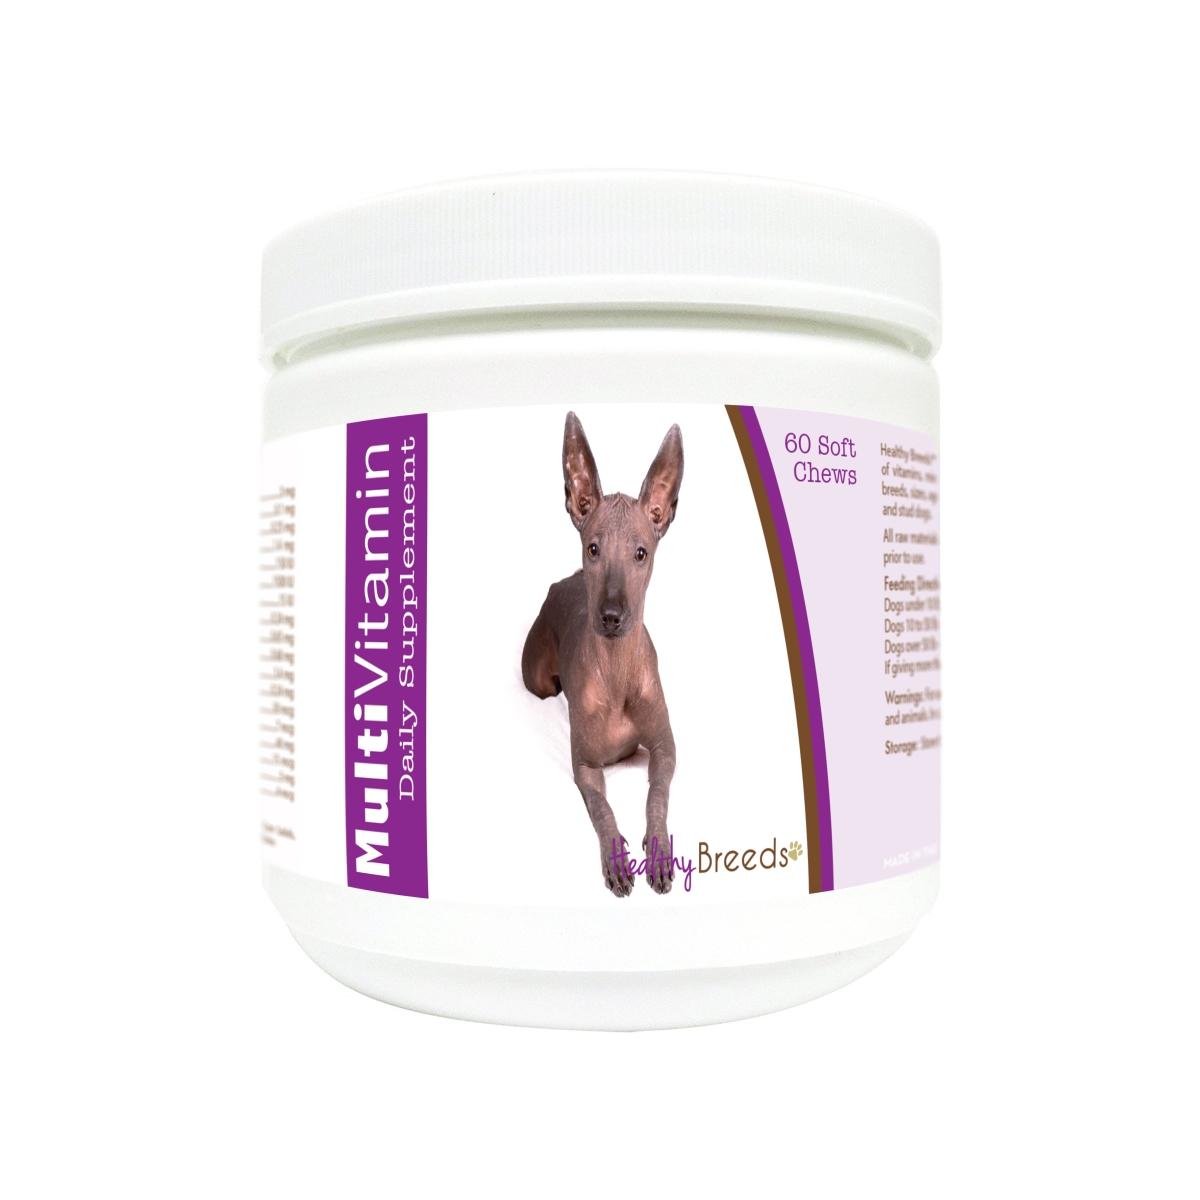 Healthy Breeds 840235178743 Xoloitzcuintli Multi-Vitamin Soft Chews - 60 Count